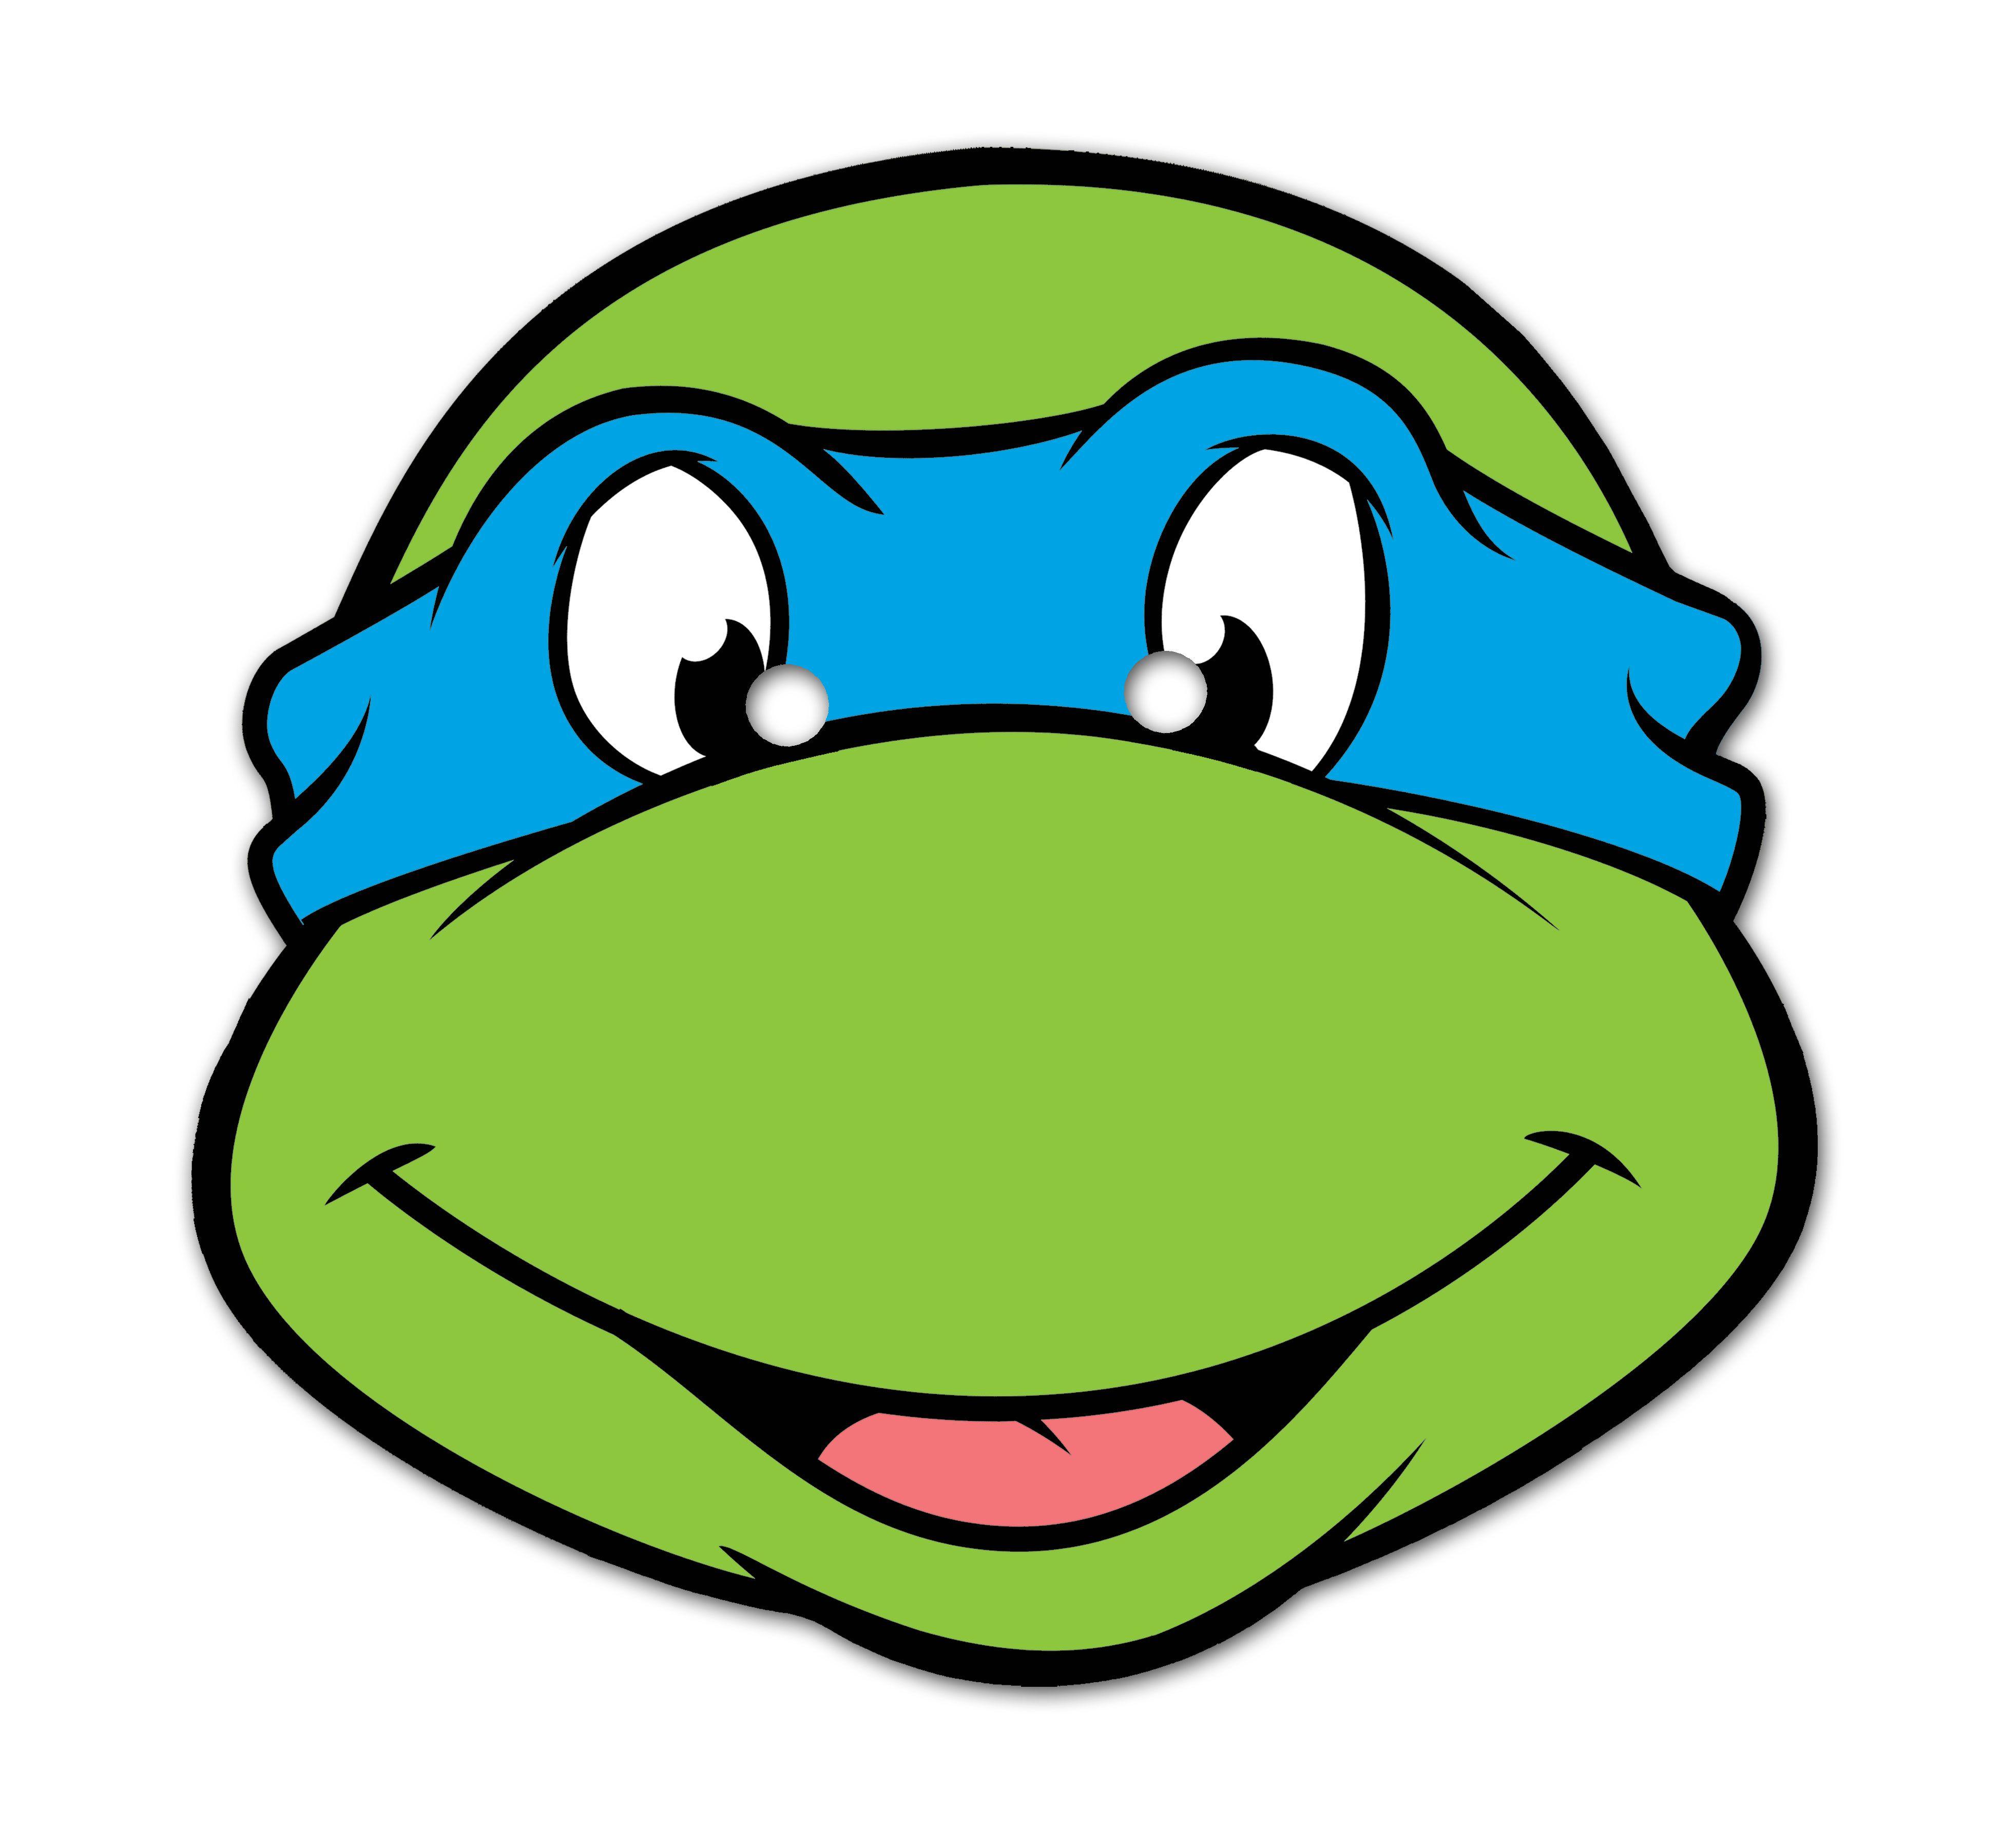 vector ninja turtle an images hub clipart best clipart best rh pinterest com ninja turtle clipart free ninja turtle clipart head